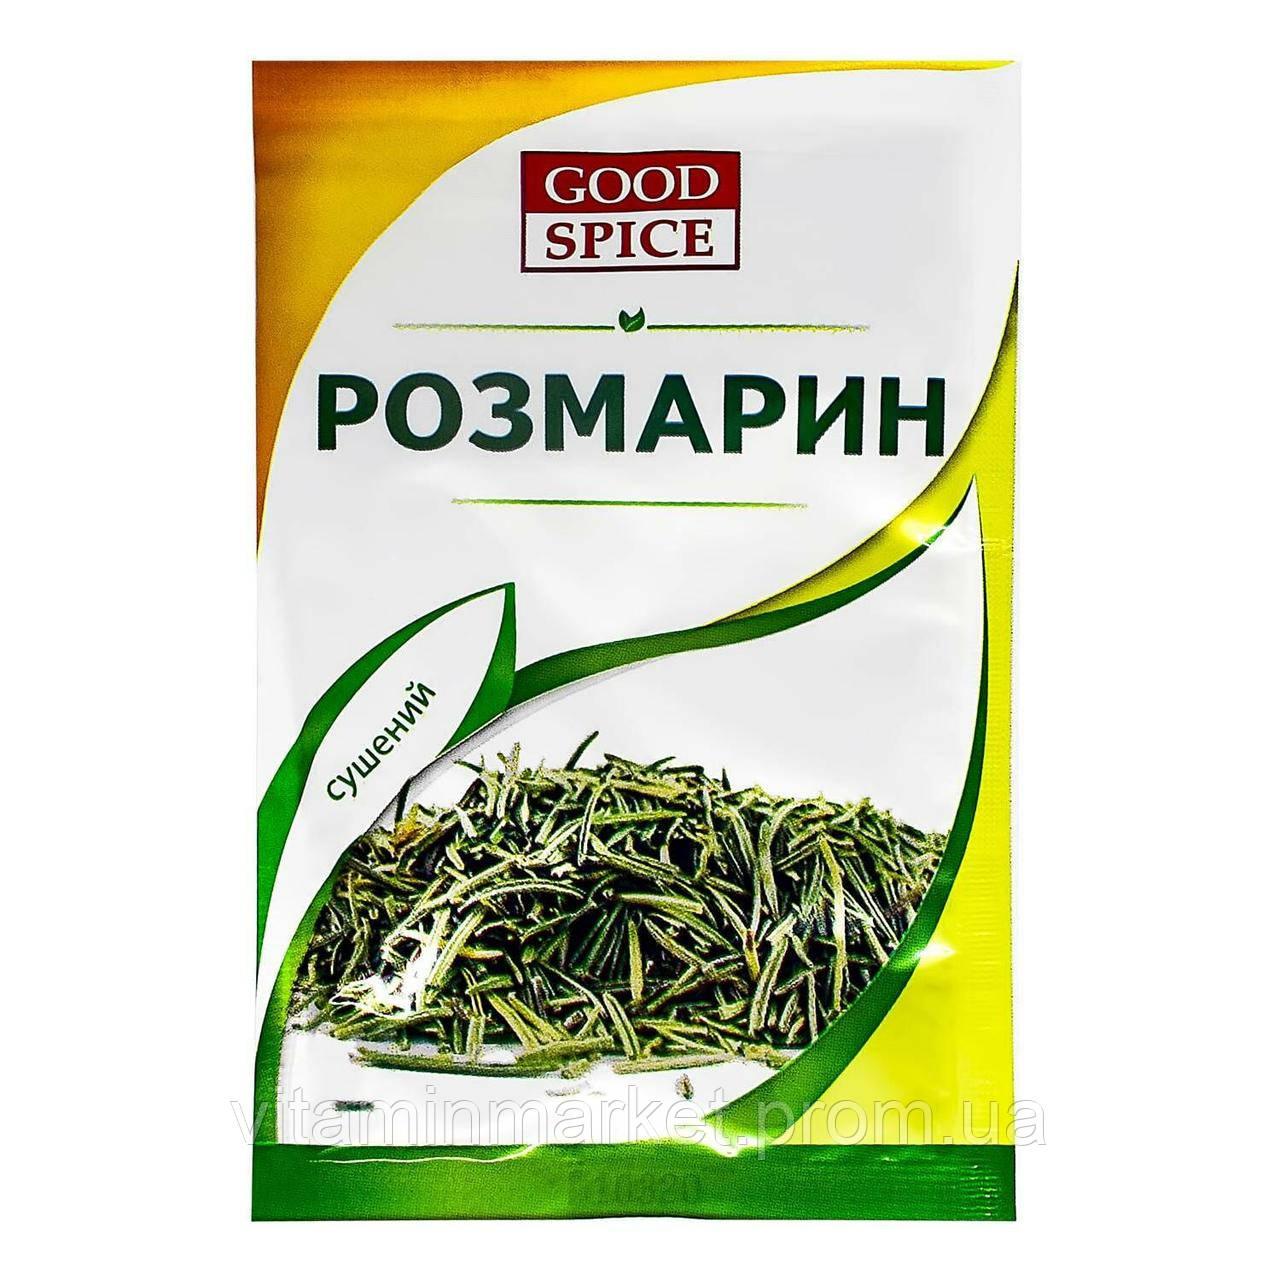 Розмарин сушений, «Good Spice», 8 гр.